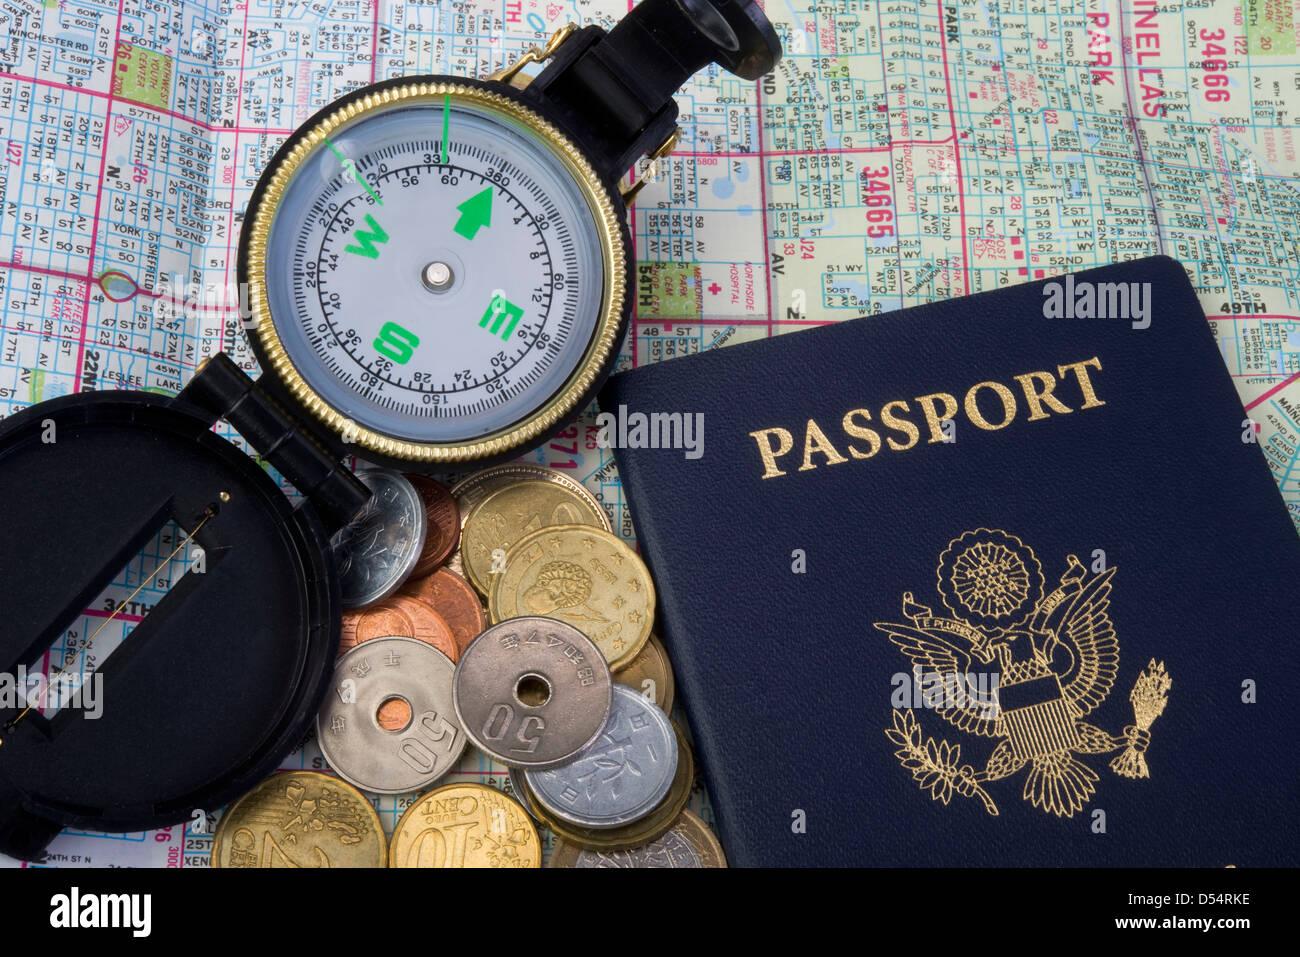 Passport and Travel. - Stock Image